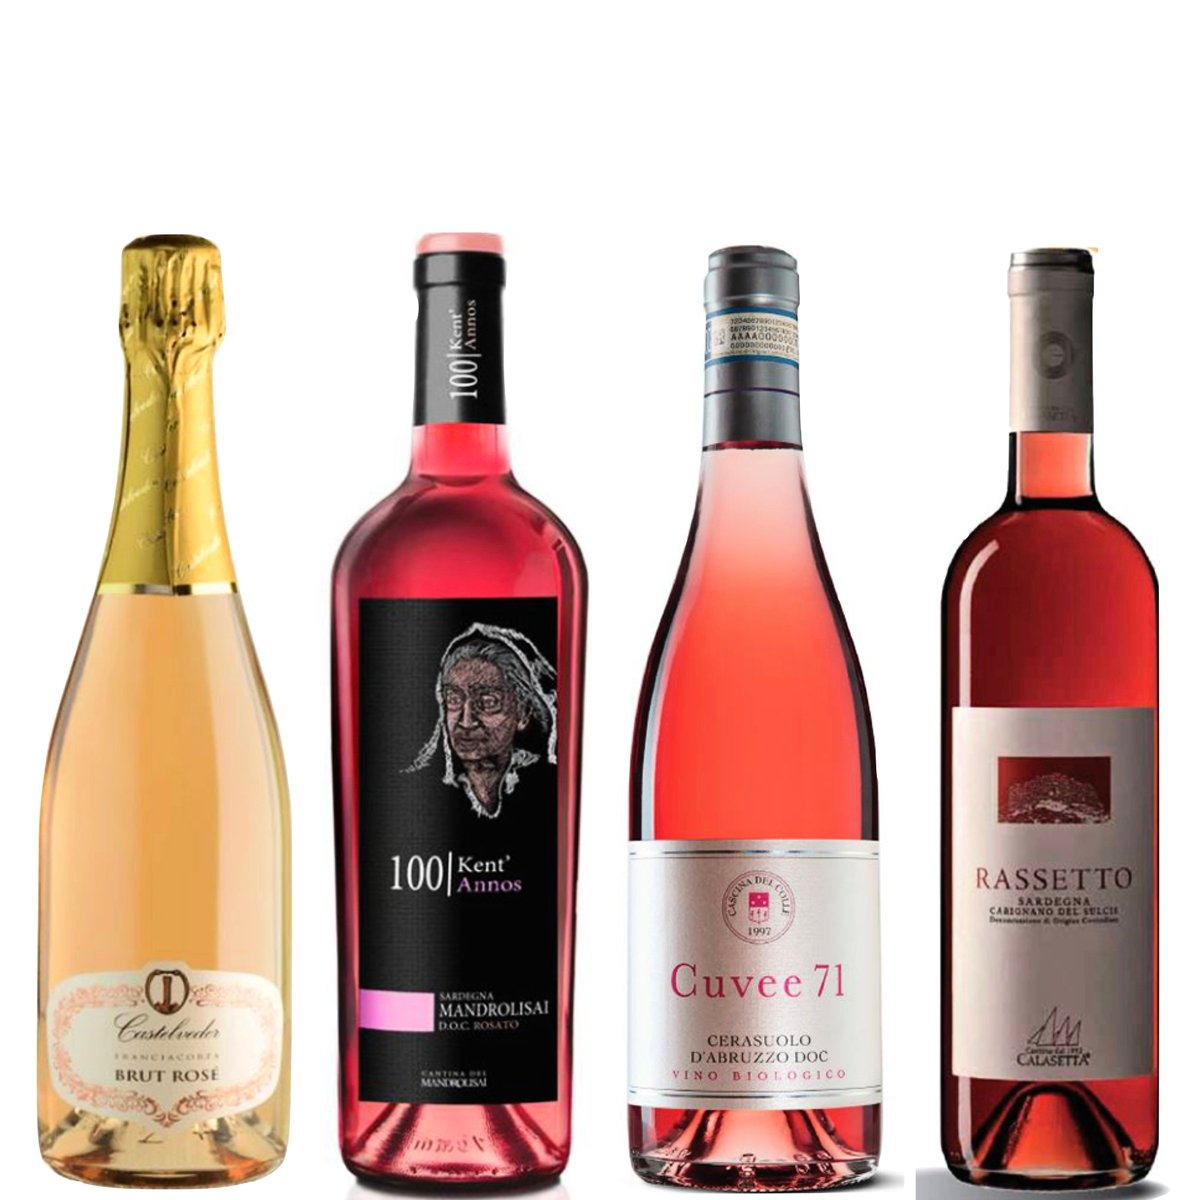 Ex Terra意大利玫瑰酒,母親節所有玫瑰酒85折。(Ex Terra提供)